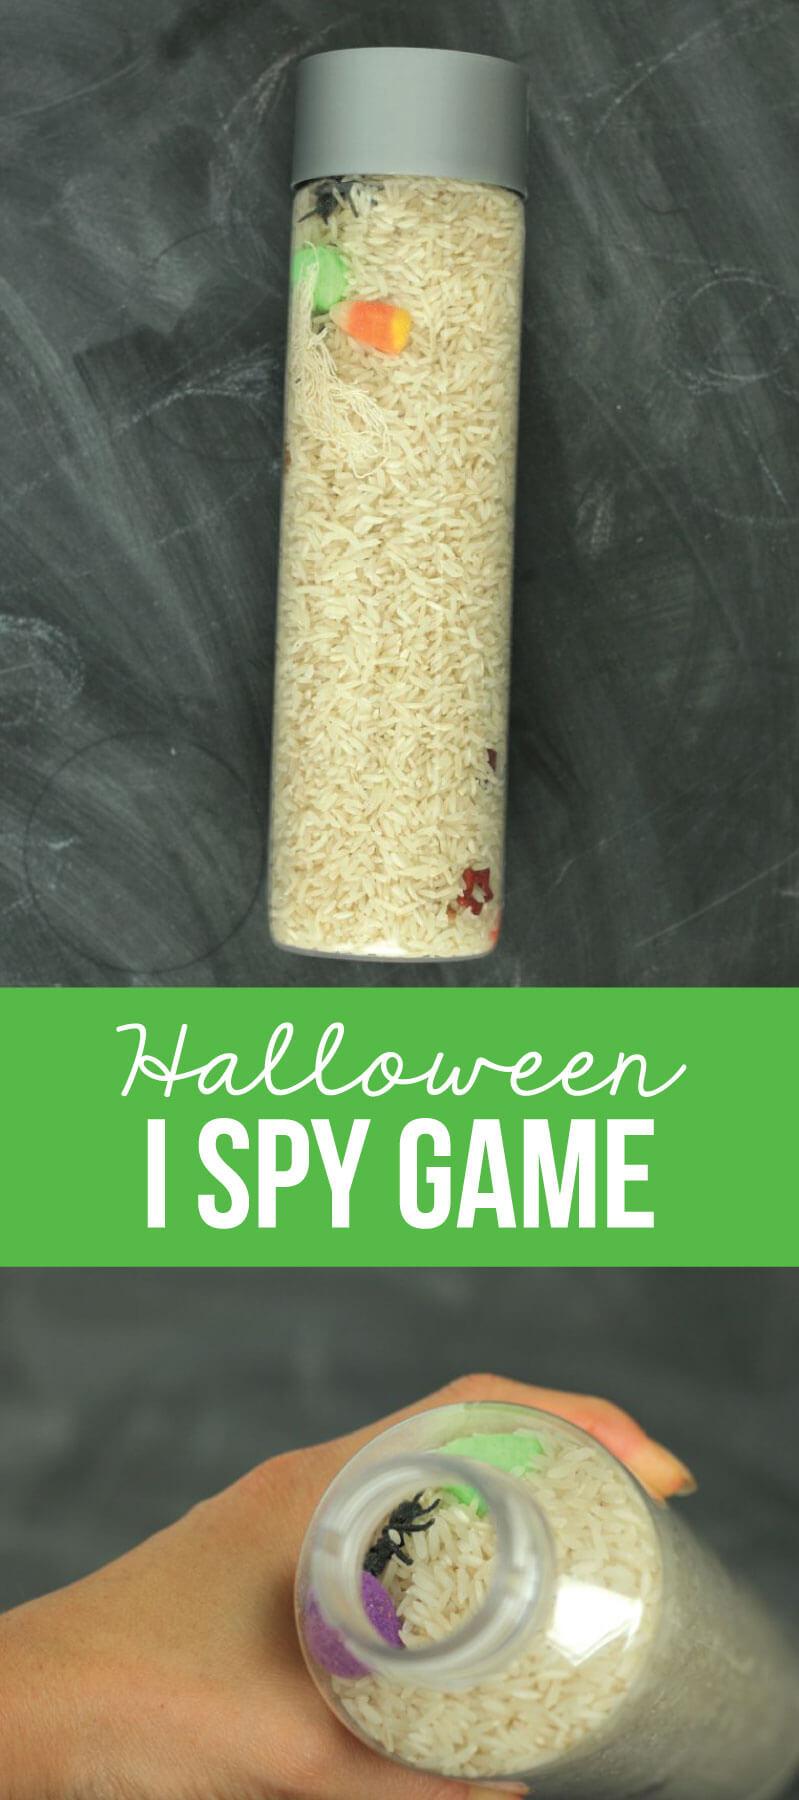 Halloween I Spy Game - really simple and fun to put together for the holiday! thirtyhandmadedays.com